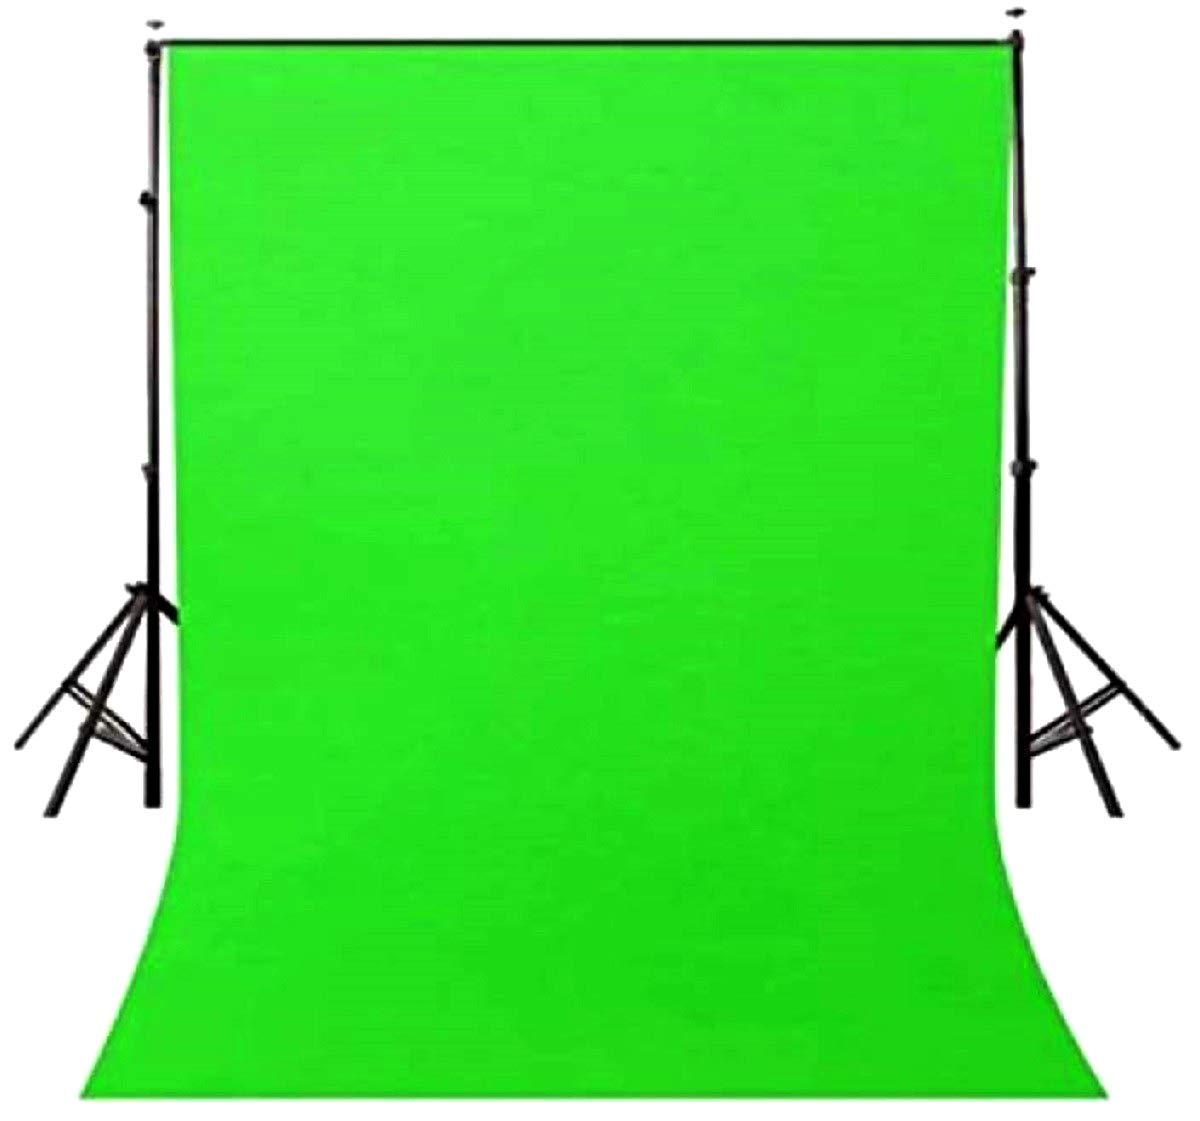 Priyam 8x12FT Green Screen  Check Price - https://amzn.to/2ZTb8W2  #GreenScreen #Background #Photography #Youtuber #utuber #TikToker #Amazon #Amazonギフト券 #AmazonDeals #amazondeal #onlineshopping #onlineshop #shoponline #shop #ShopLocal #ShopeeMY #RemoveBackground #VideoEditorpic.twitter.com/mye609m9OE